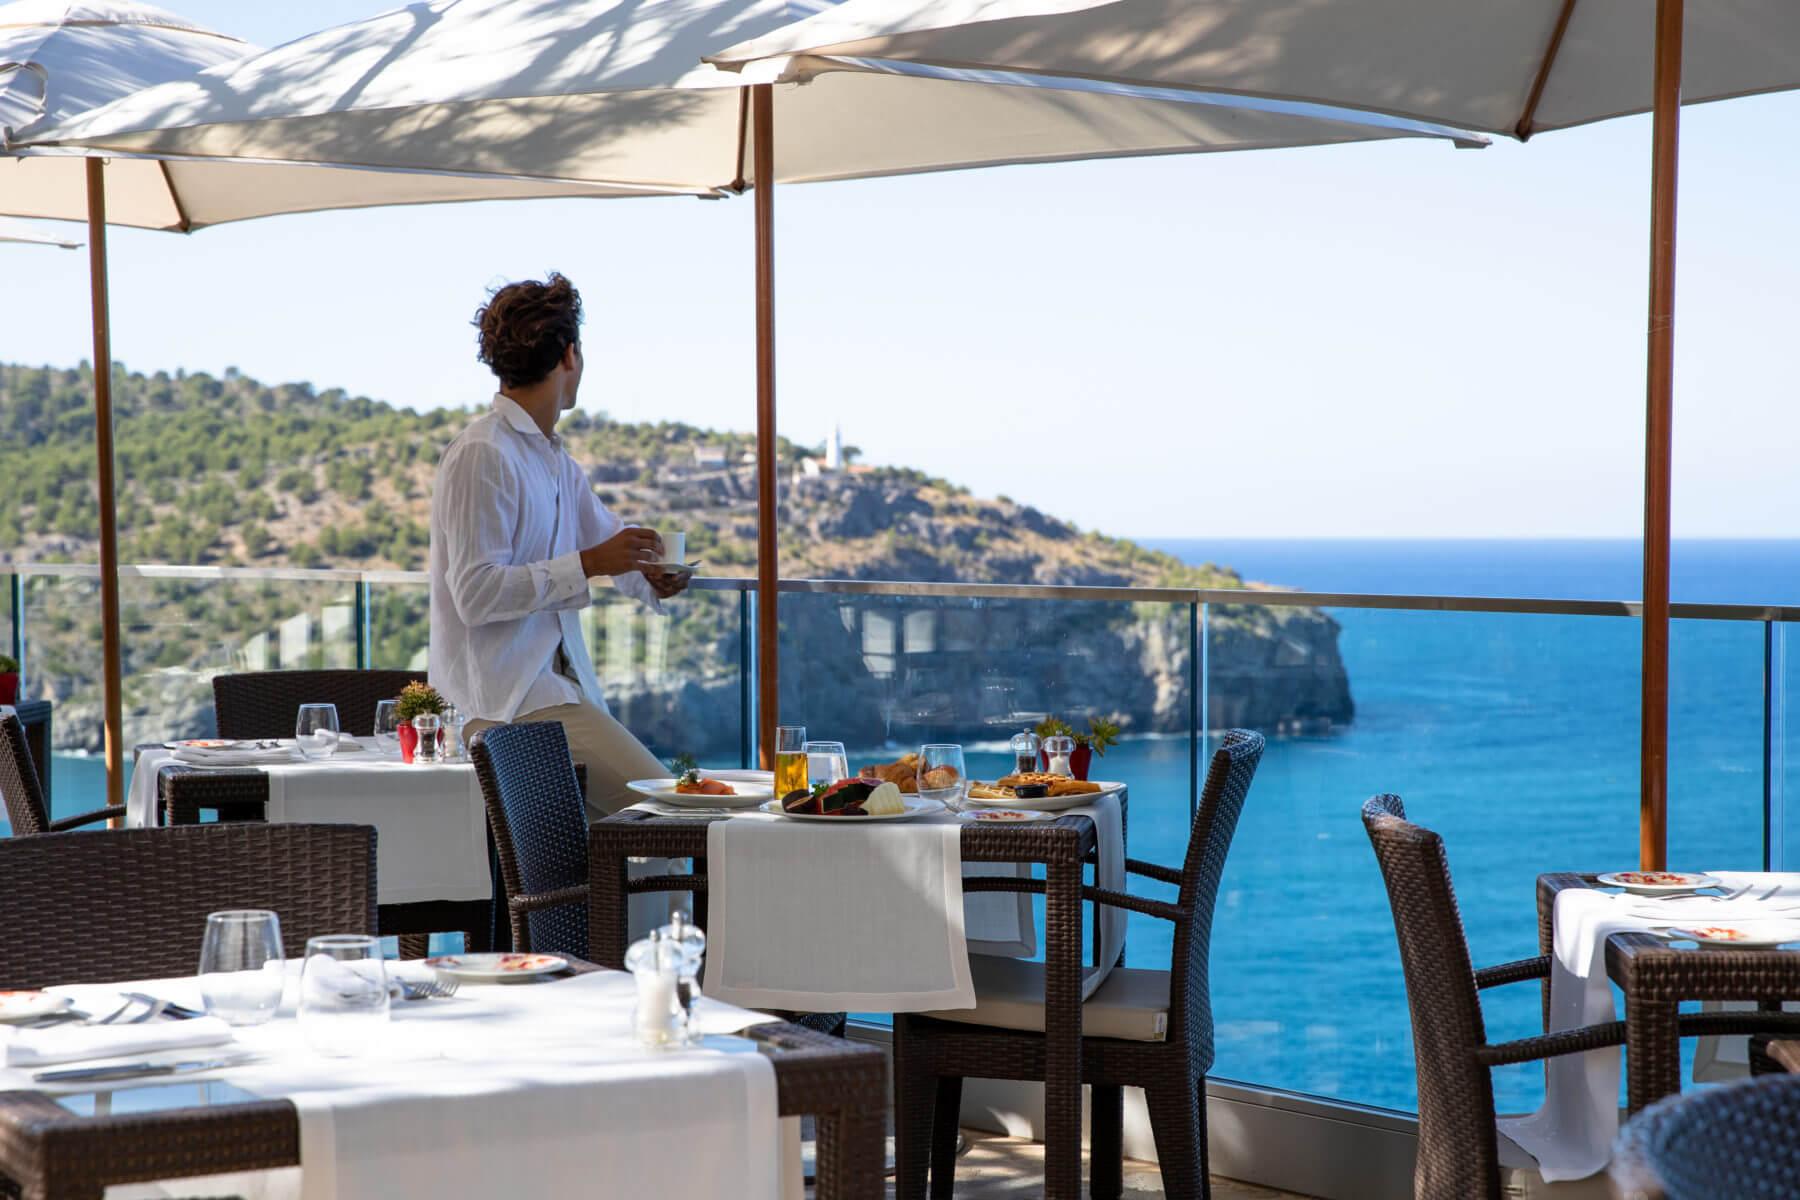 Jumeirah Port Soller Hotel & Spa, understated luxury in Mallorca